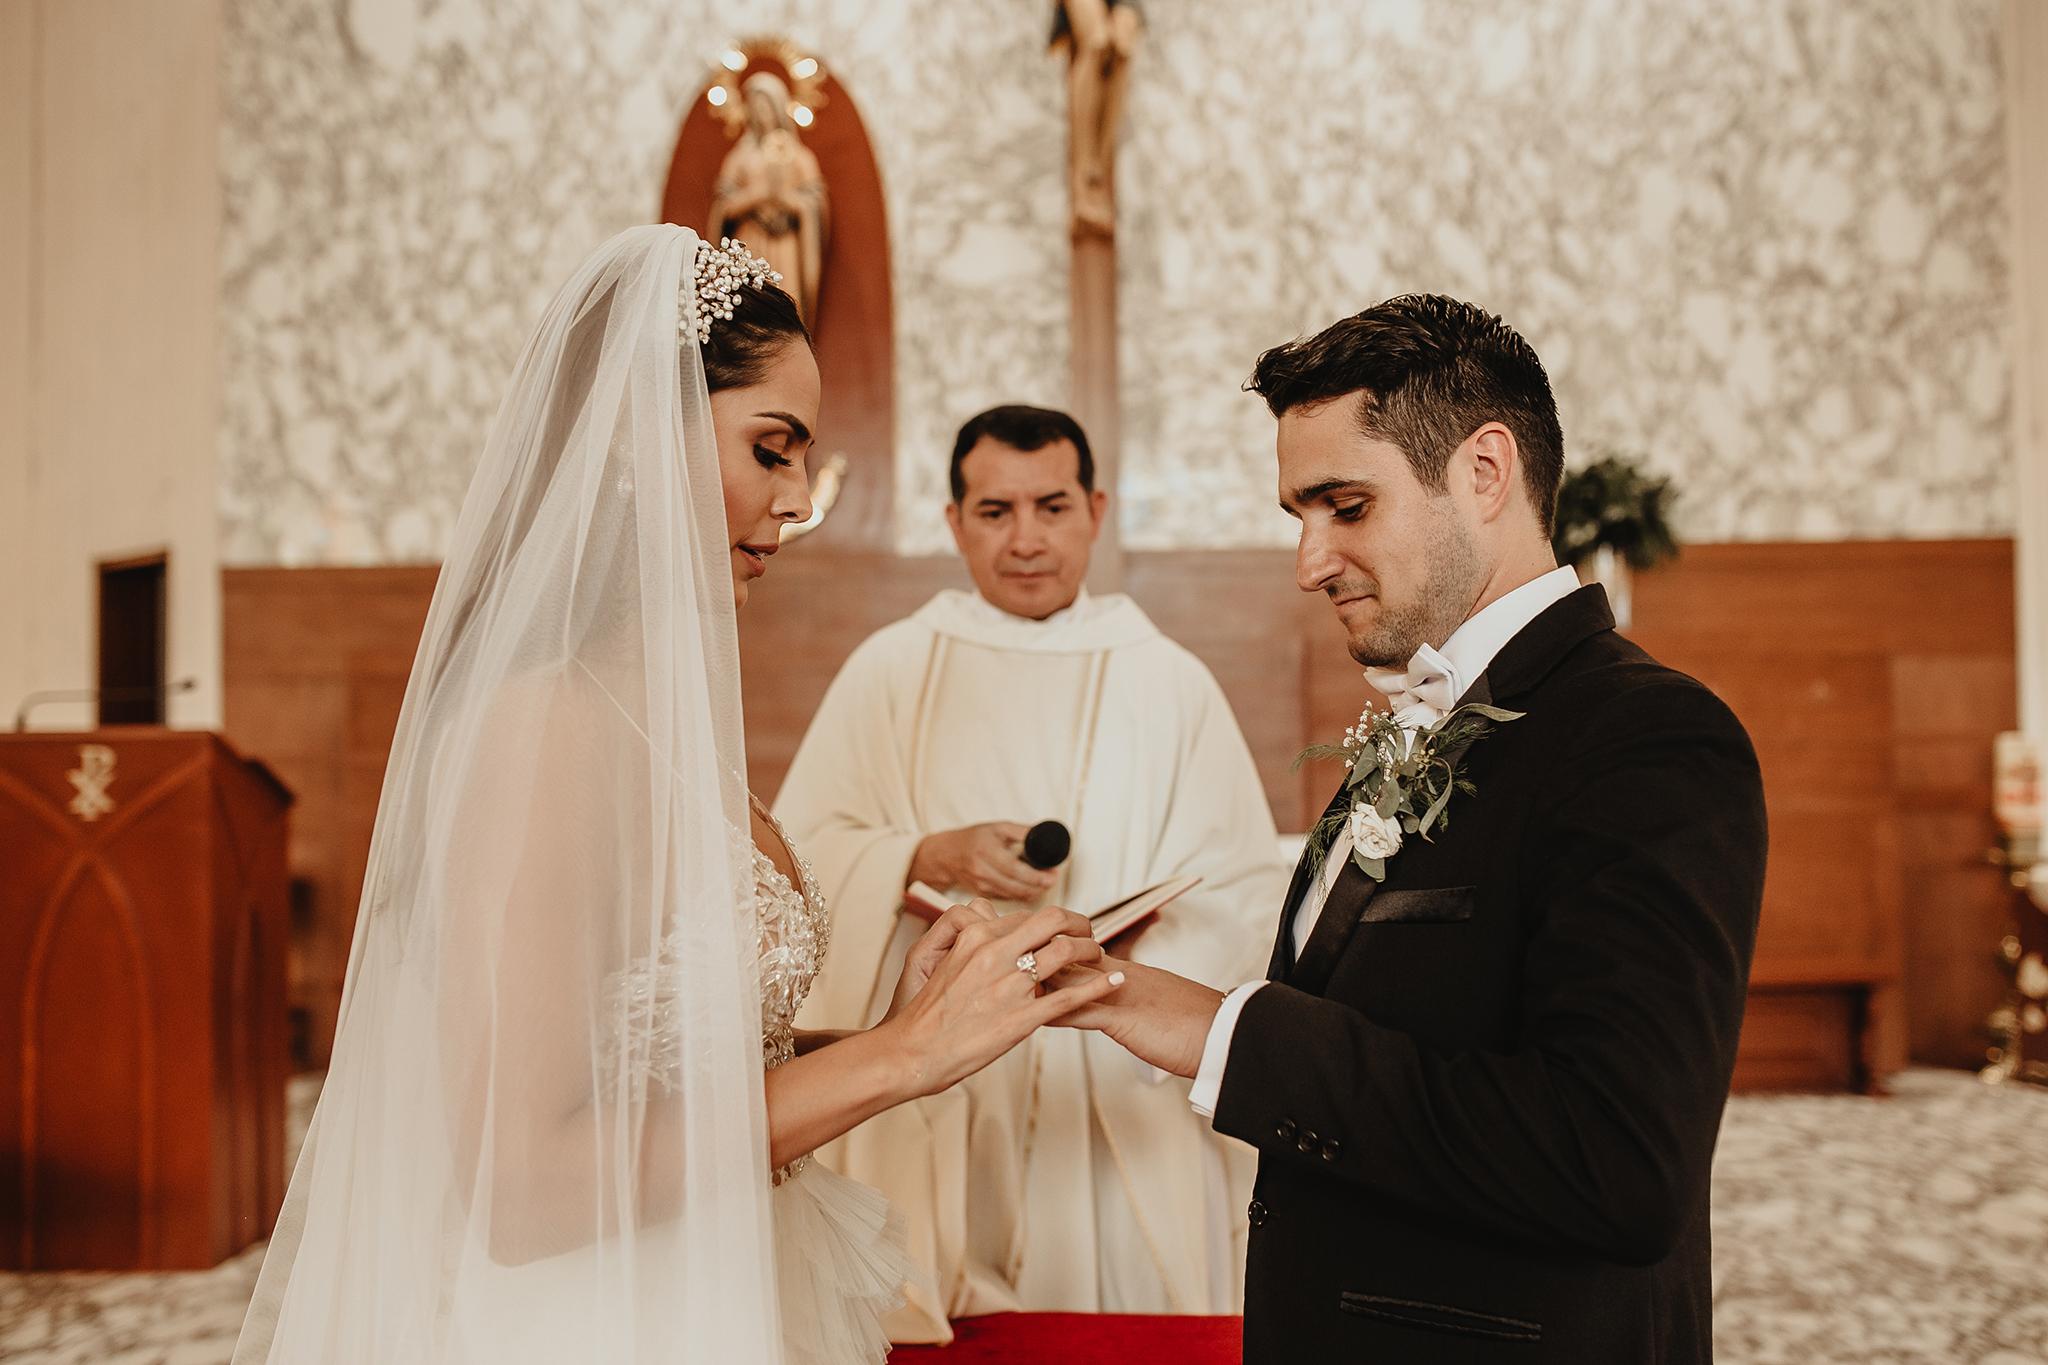 0659R&F__WeddingDestination_Weddingmerida_BodaMexico_FotografoDeBodas_FabrizioSimoneenFotografo.jpg